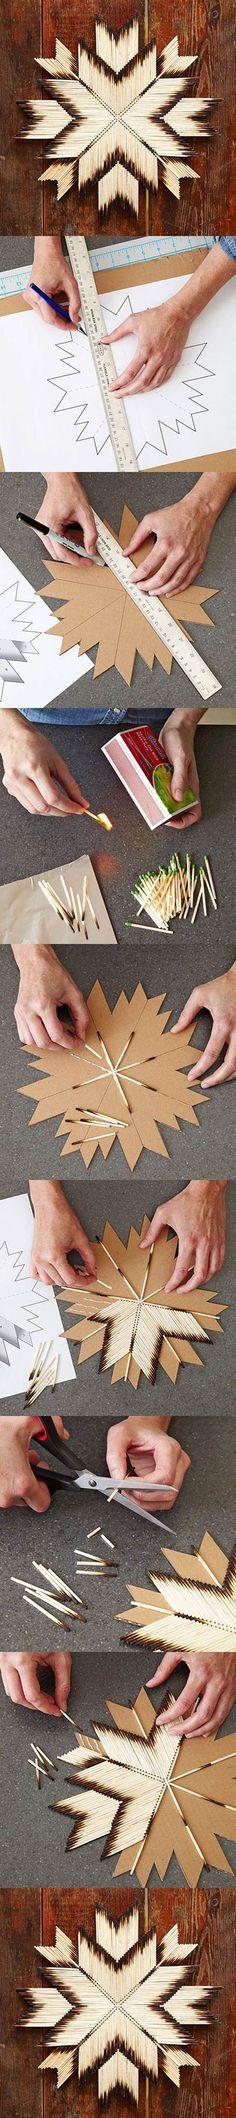 So Cool Craft   DIY & Crafts Tutorials